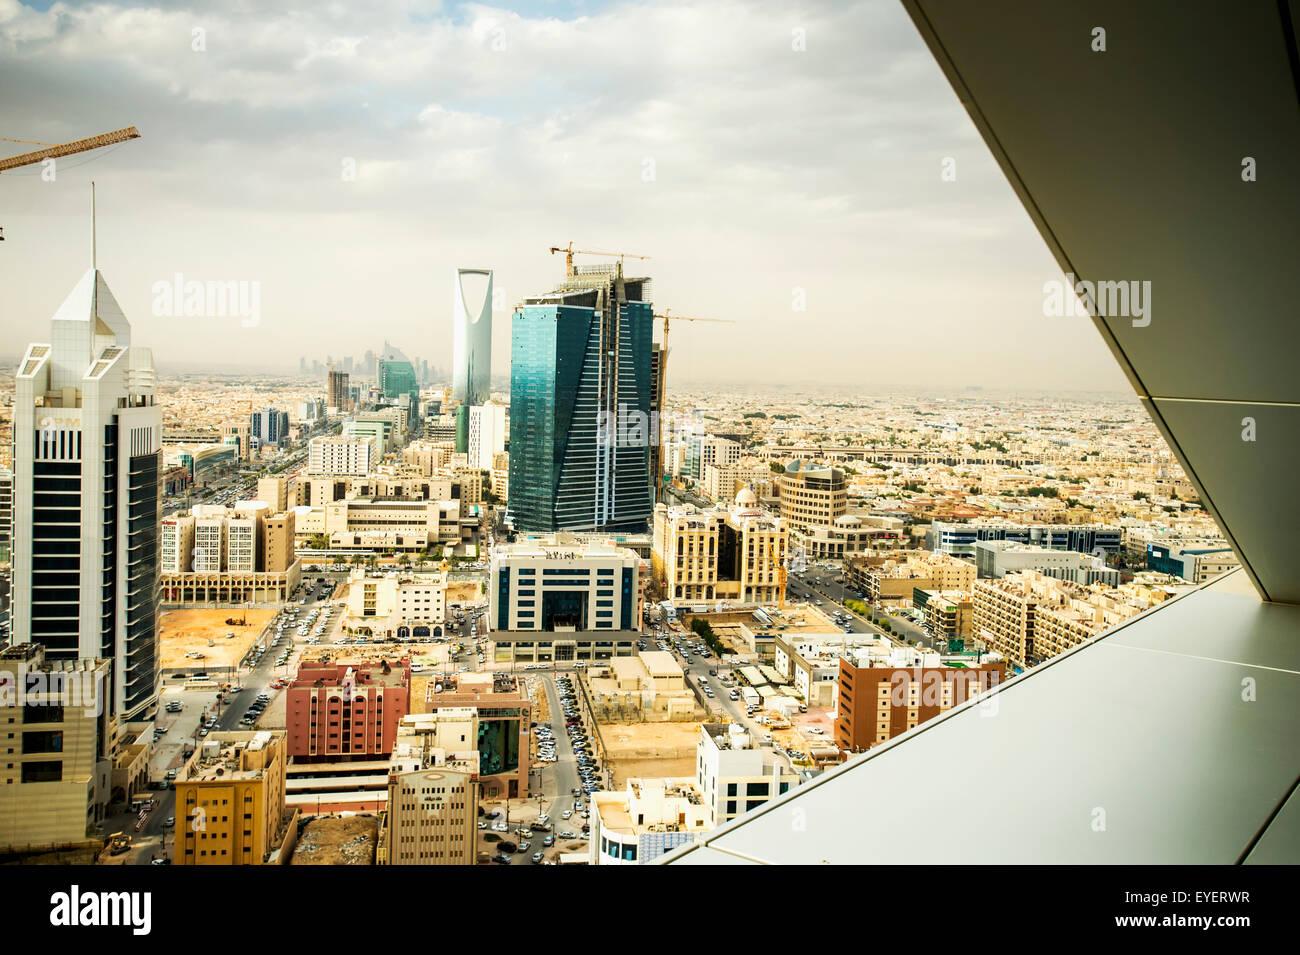 paysage urbain riyadh arabie saoudite banque d 39 images. Black Bedroom Furniture Sets. Home Design Ideas